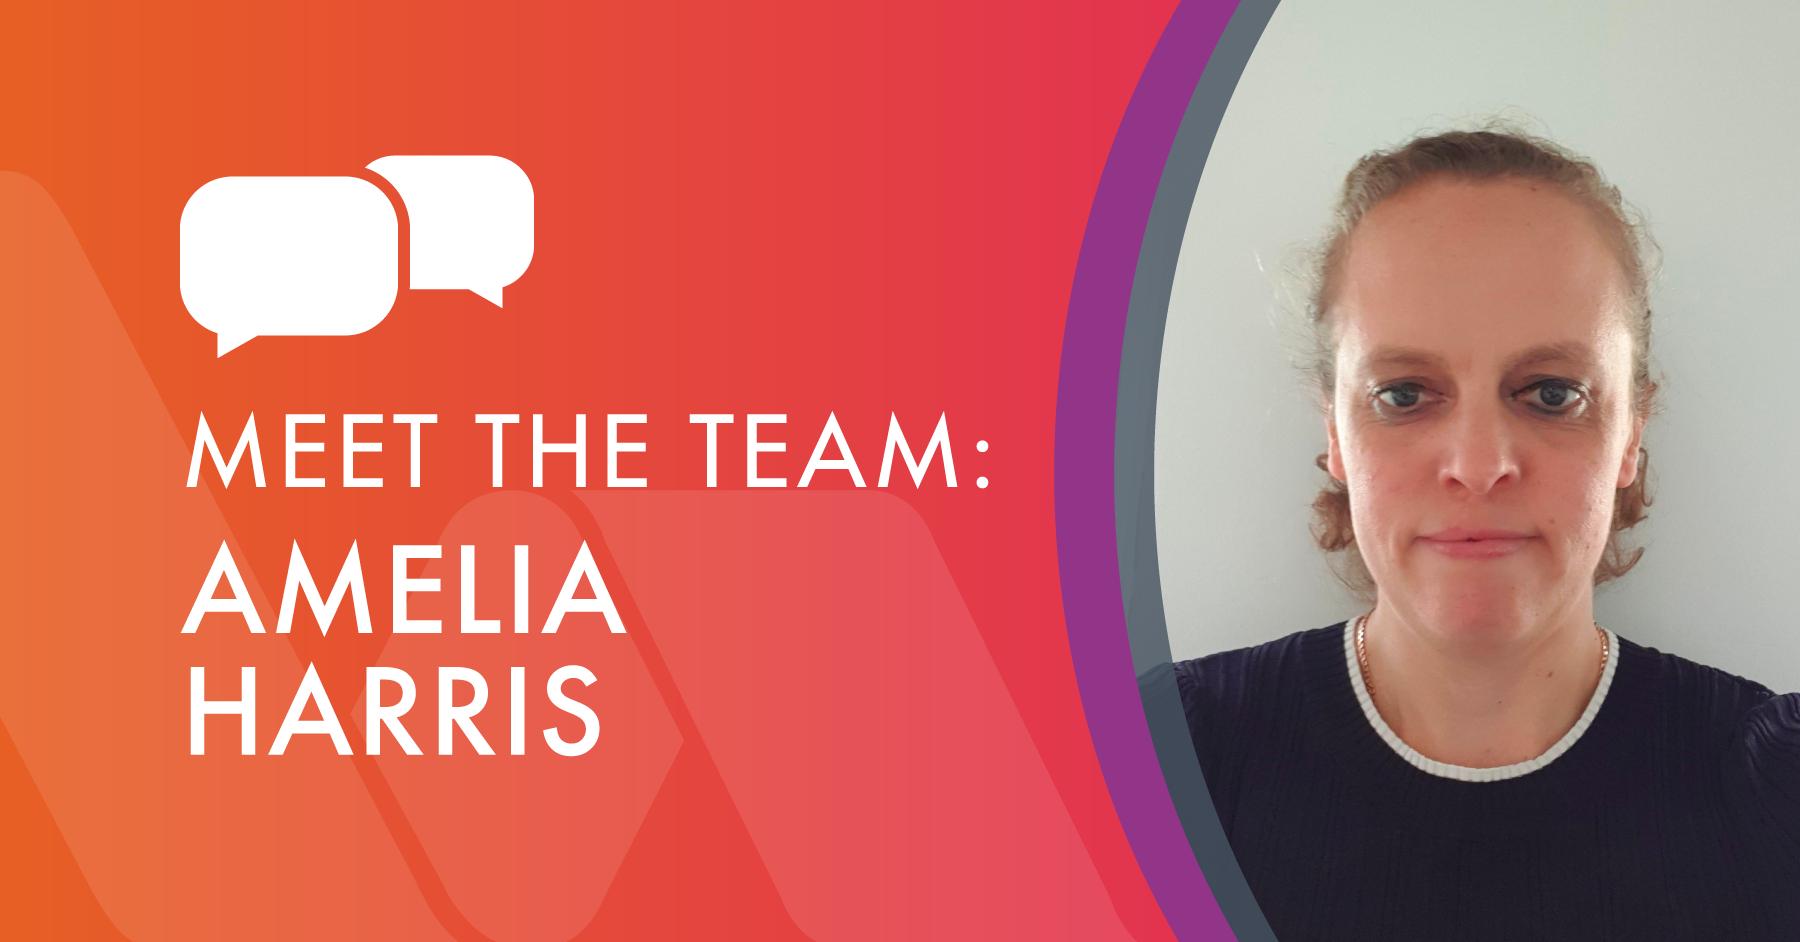 Meet the Team - Amelia Harris, Financial Controller